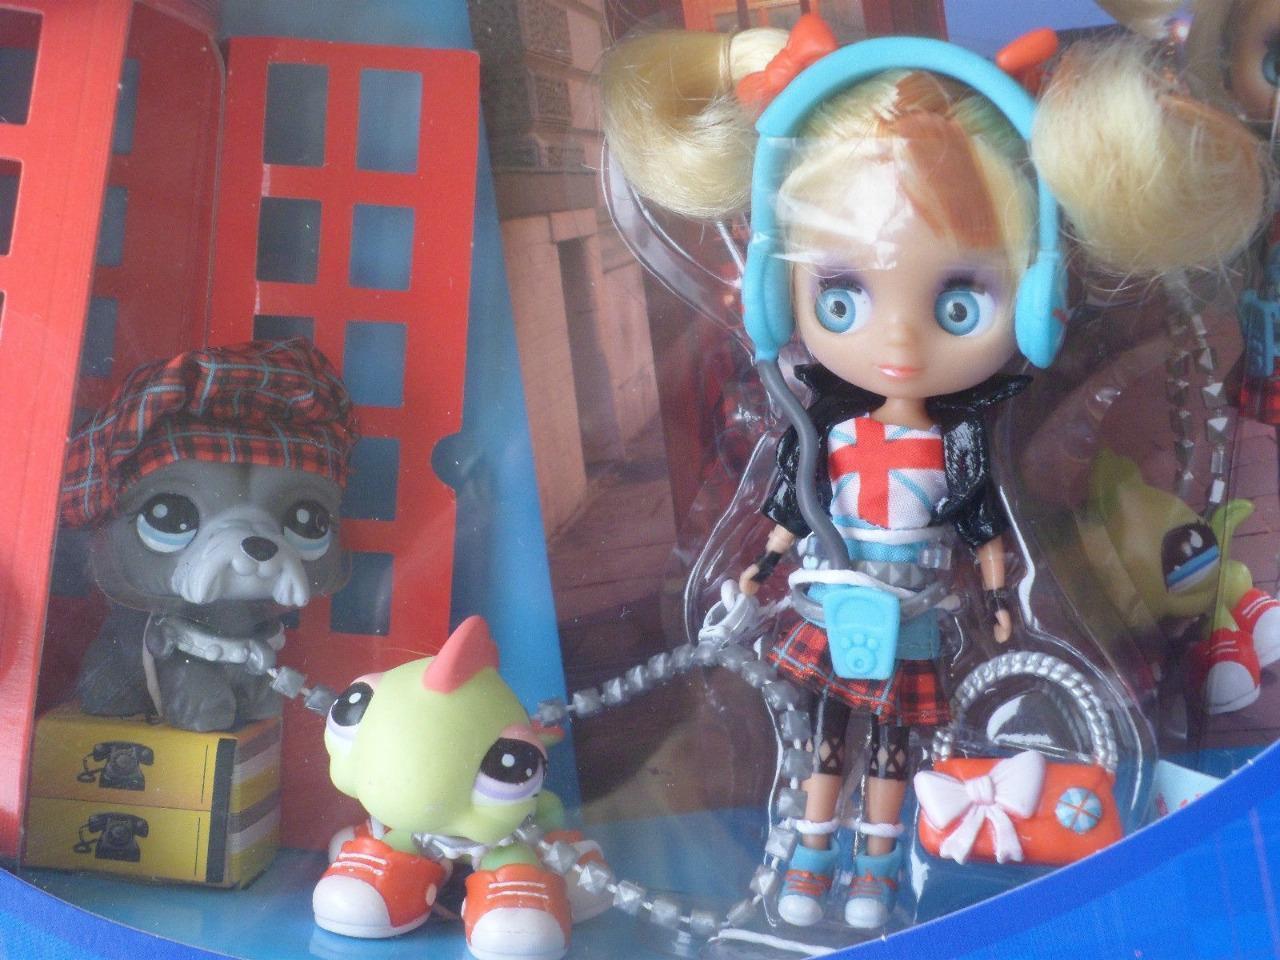 Littlest Pet Shop Hasbro Blythe B13 Sightseeing Sightseeing Sightseeing Cute lot Retired NIB e2e001